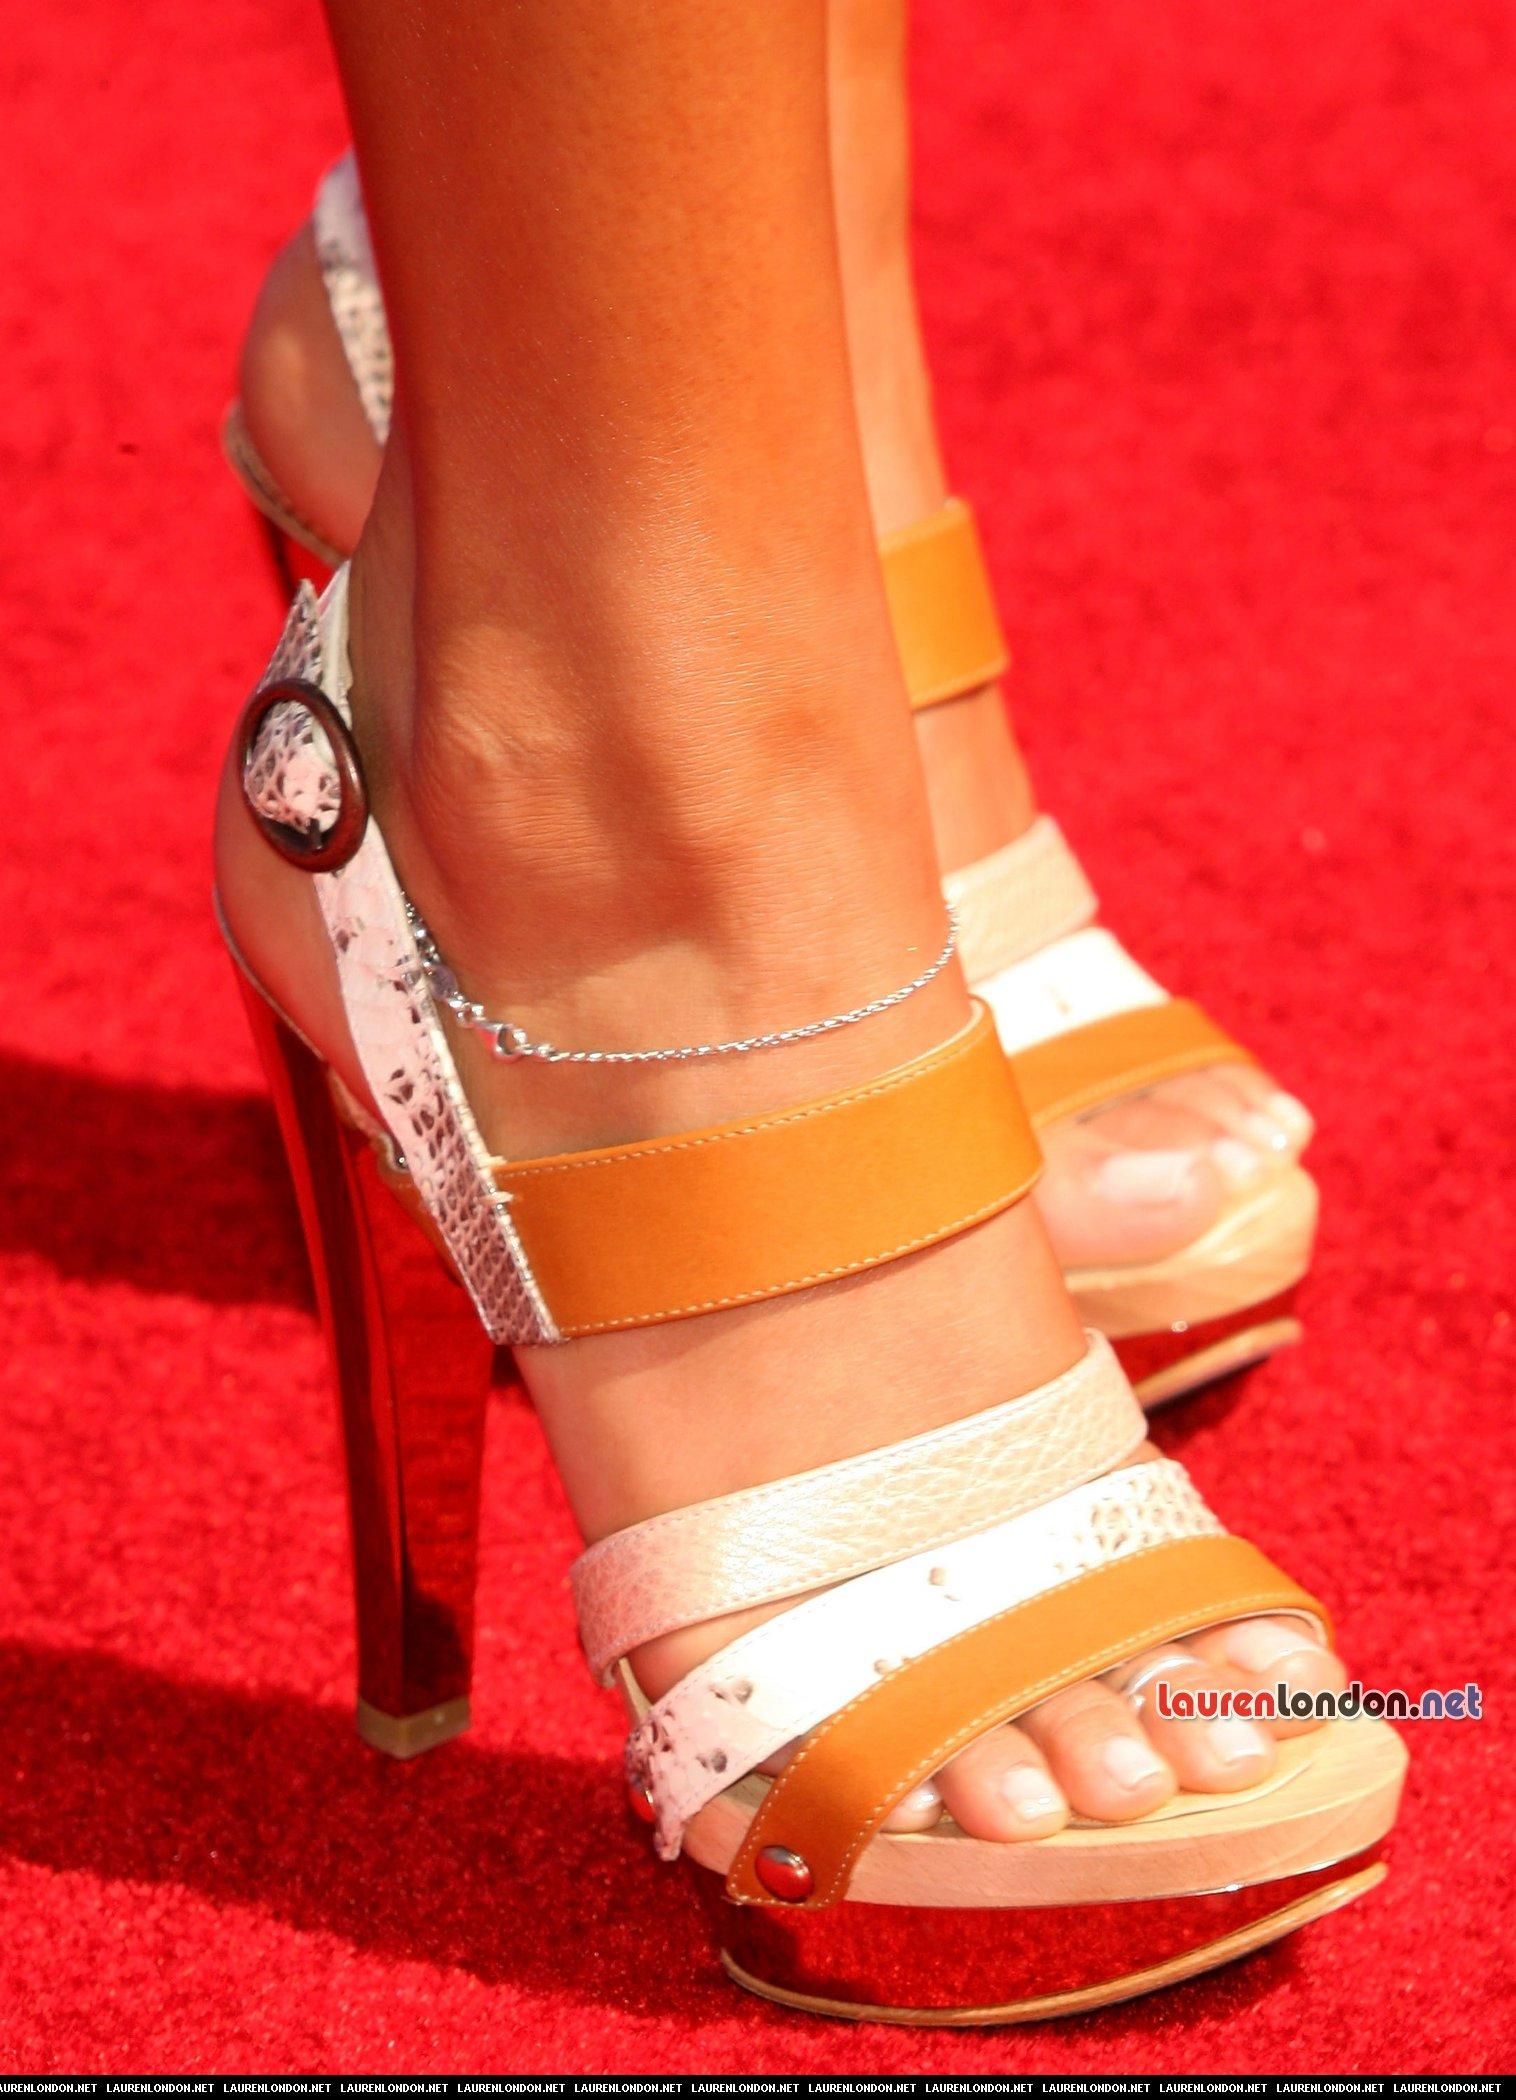 Lauren London's Feet